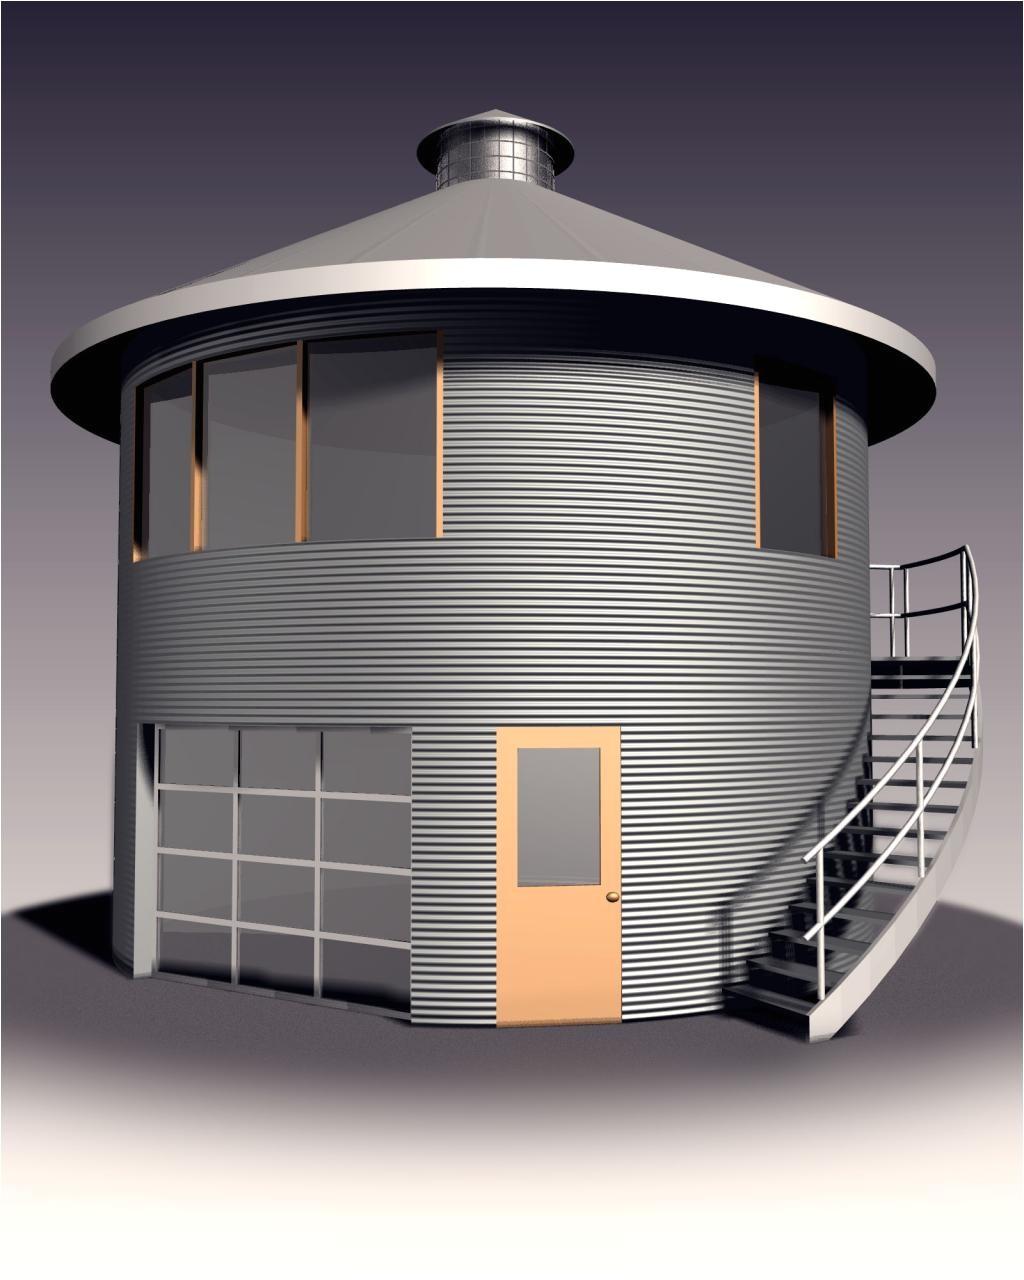 grain silo house history